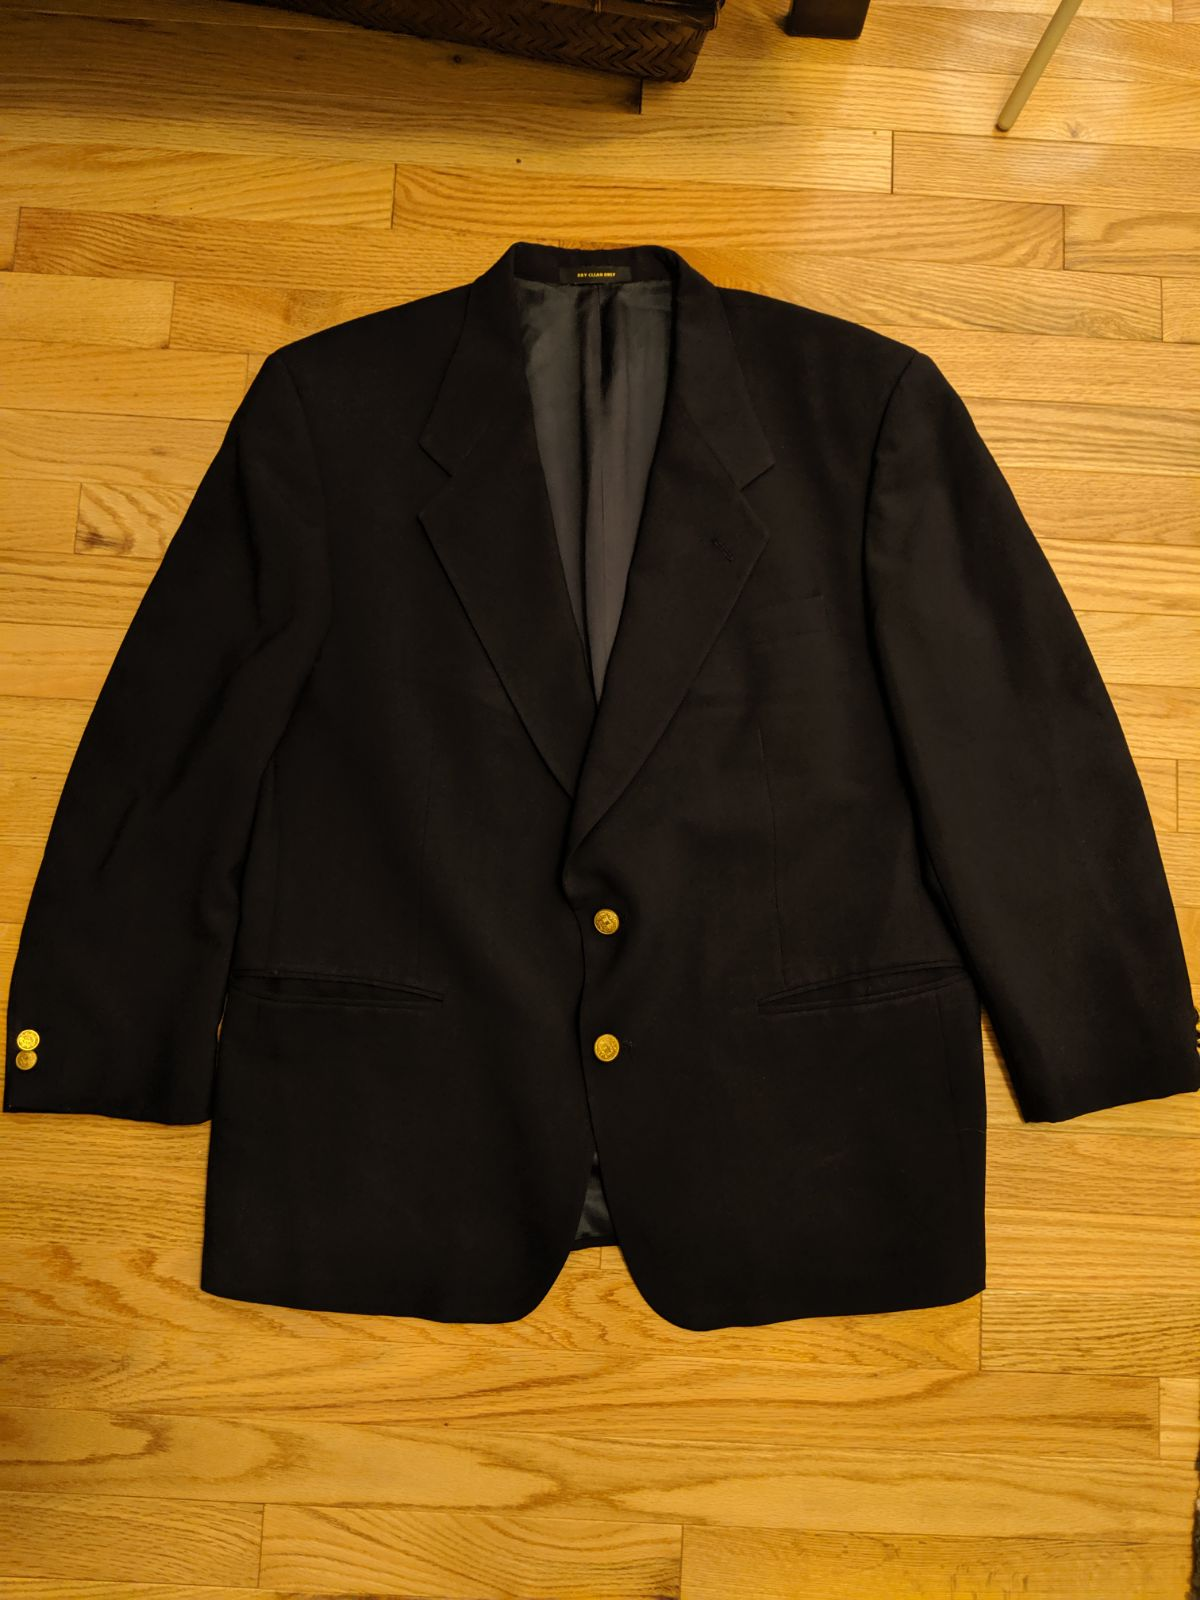 Givenchy vintage navy blue blazer jacket